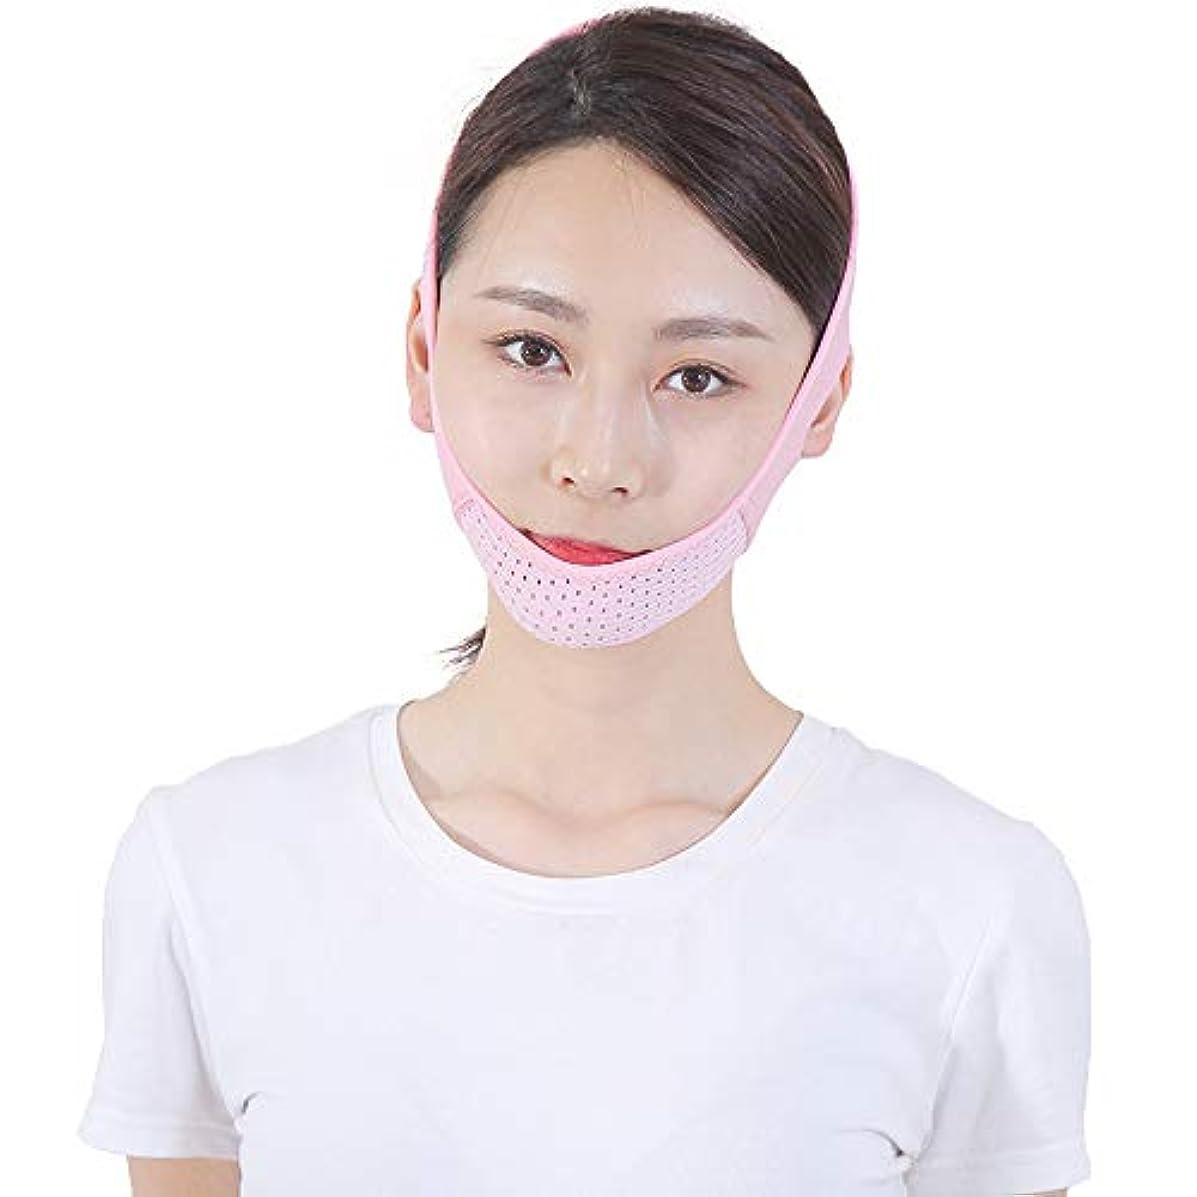 GYZ フェイシャルリフティング痩身ベルトフェイススリムゲットダブルチンアンチエイジングリンクルフェイスバンデージマスクシェイピングマスク顔を引き締めるダブルチンワークアウト Thin Face Belt